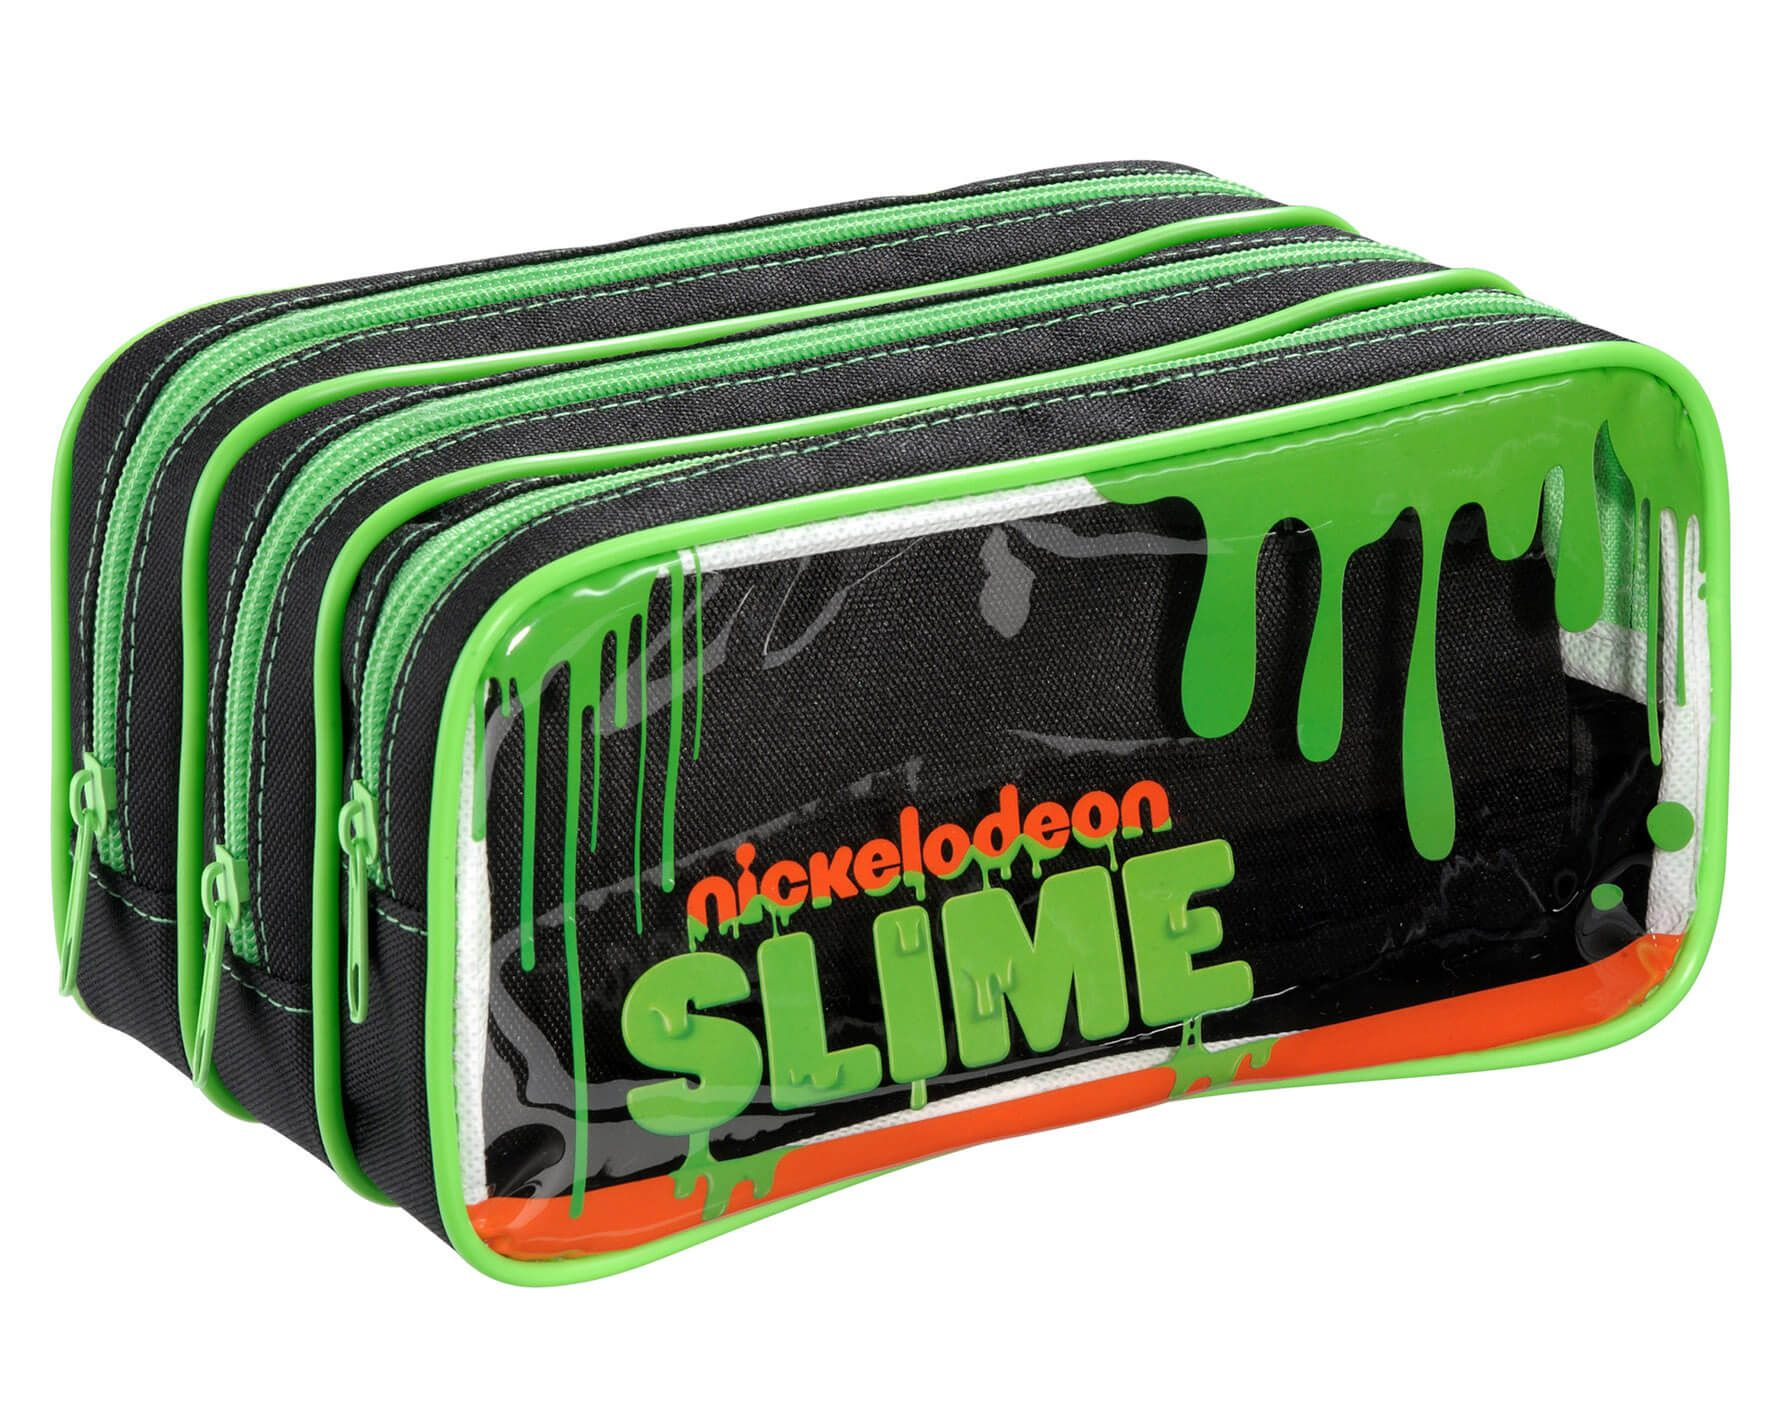 Estojo Nickelodeon Slime com 3 Compartimentos - Foroni